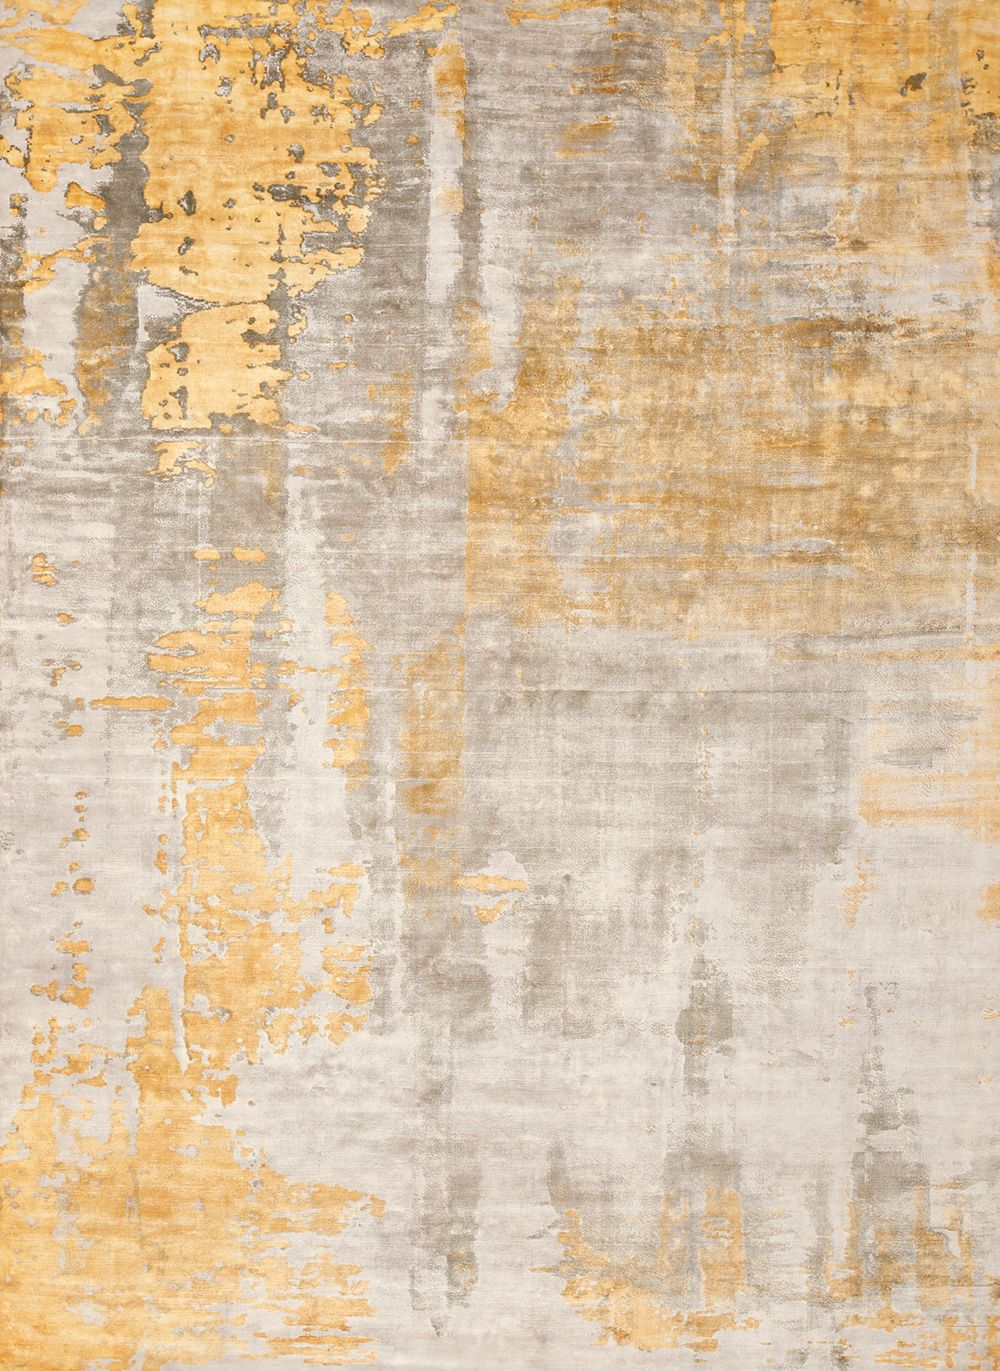 Artisan 1601 Country Carpet Textured Carpet Contemporary Carpet Modern Carpets Design